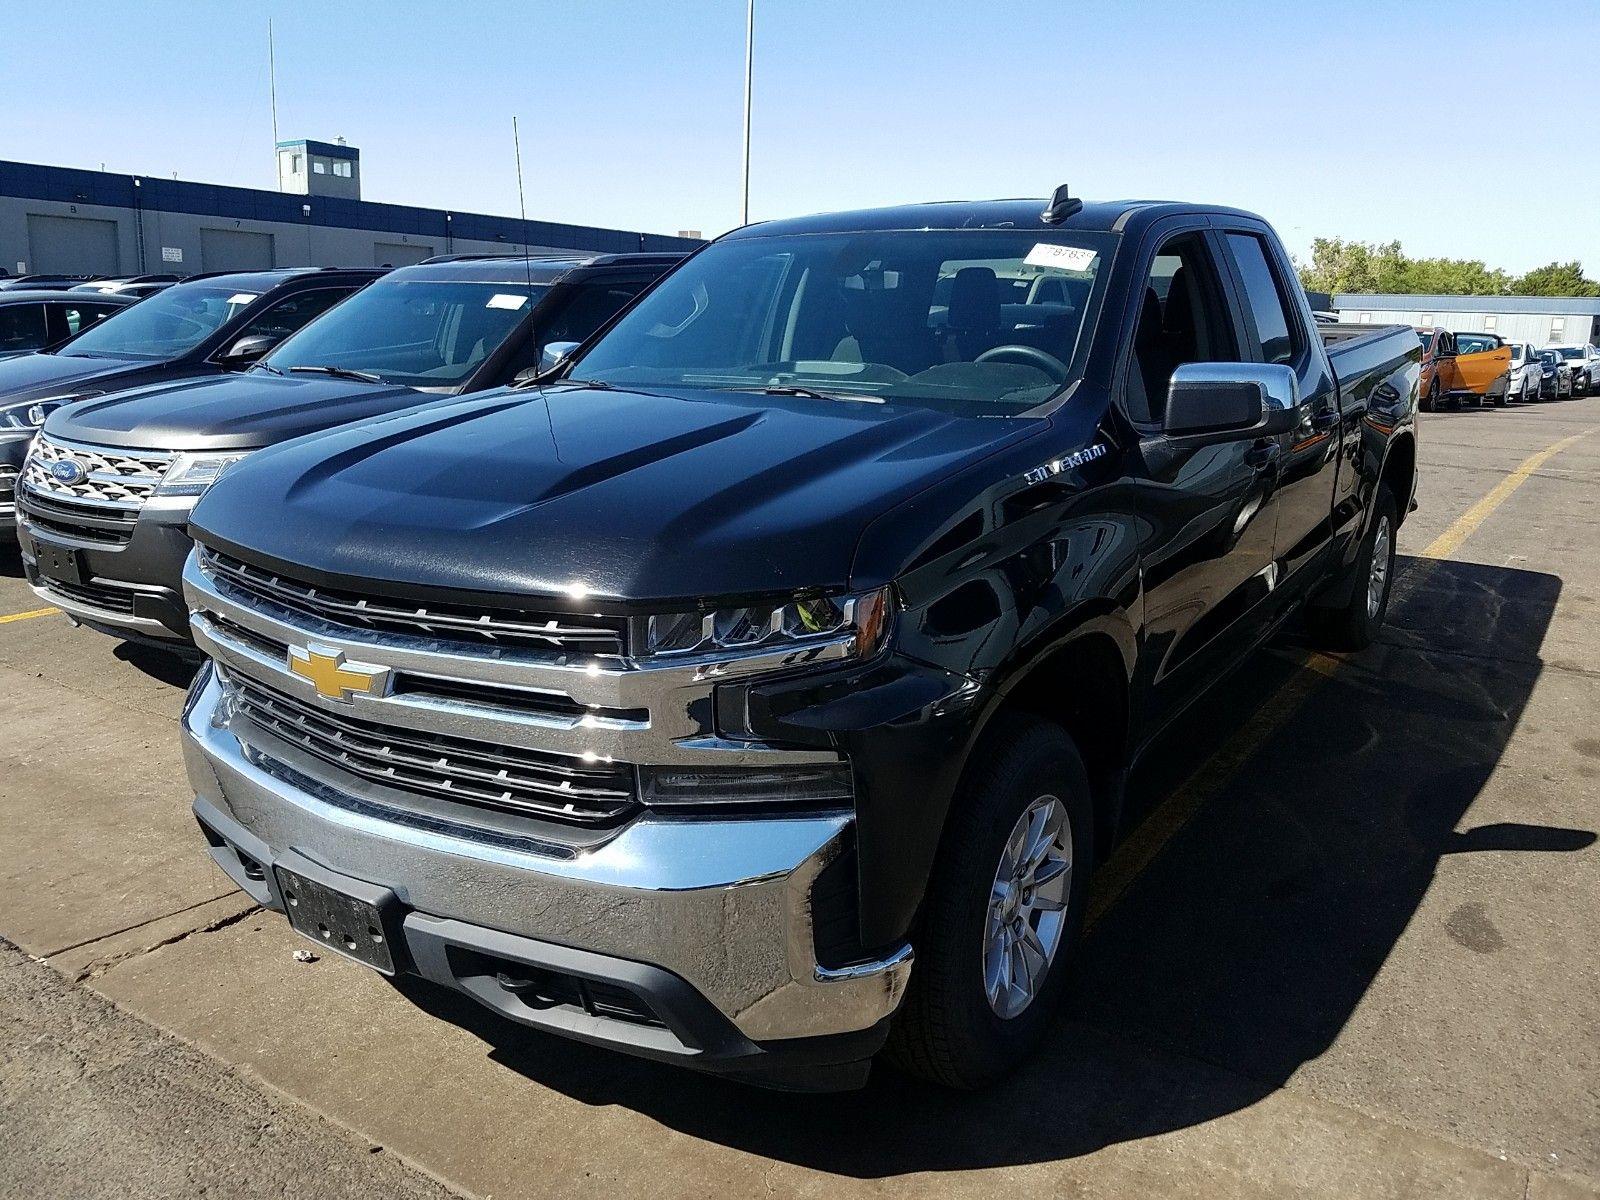 2020 Chevrolet Silverado 5.3. Lot 99913283728 Vin 1GCRYDED9LZ157528